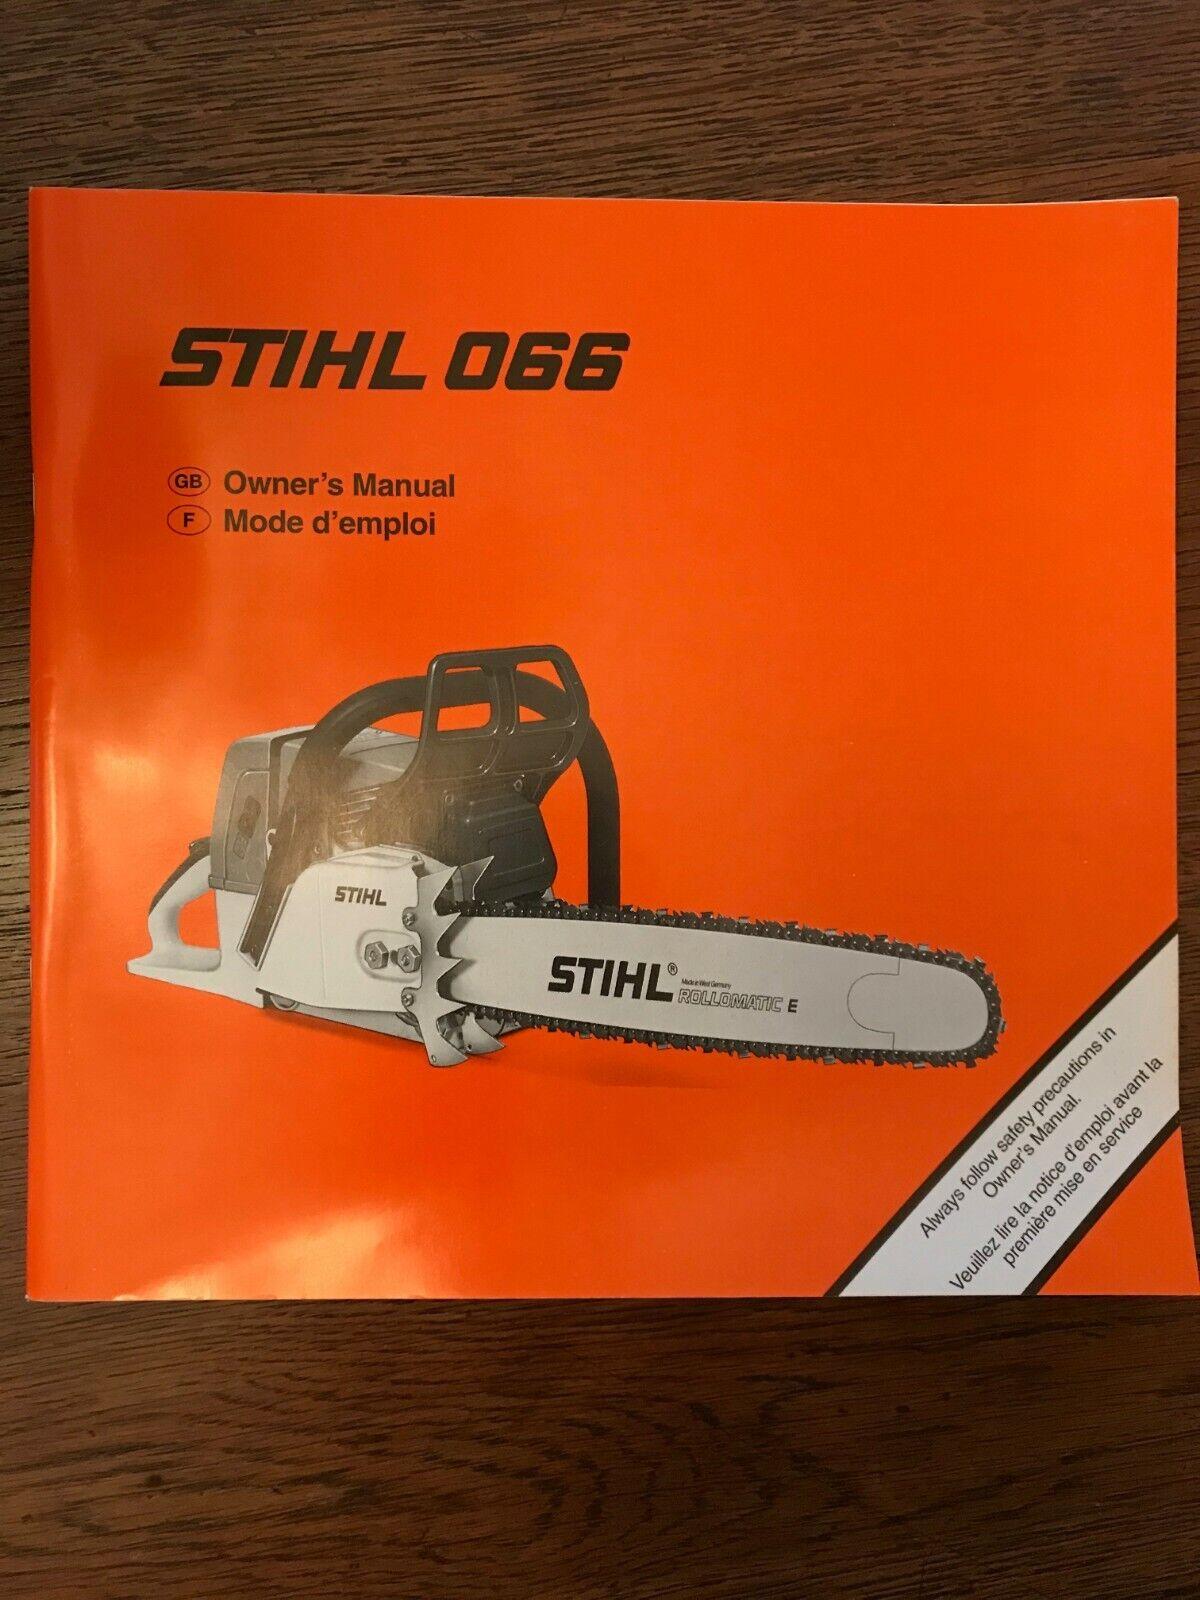 Stihl chain saw 064, 066 service manual p/n 045 130 0123 (285.